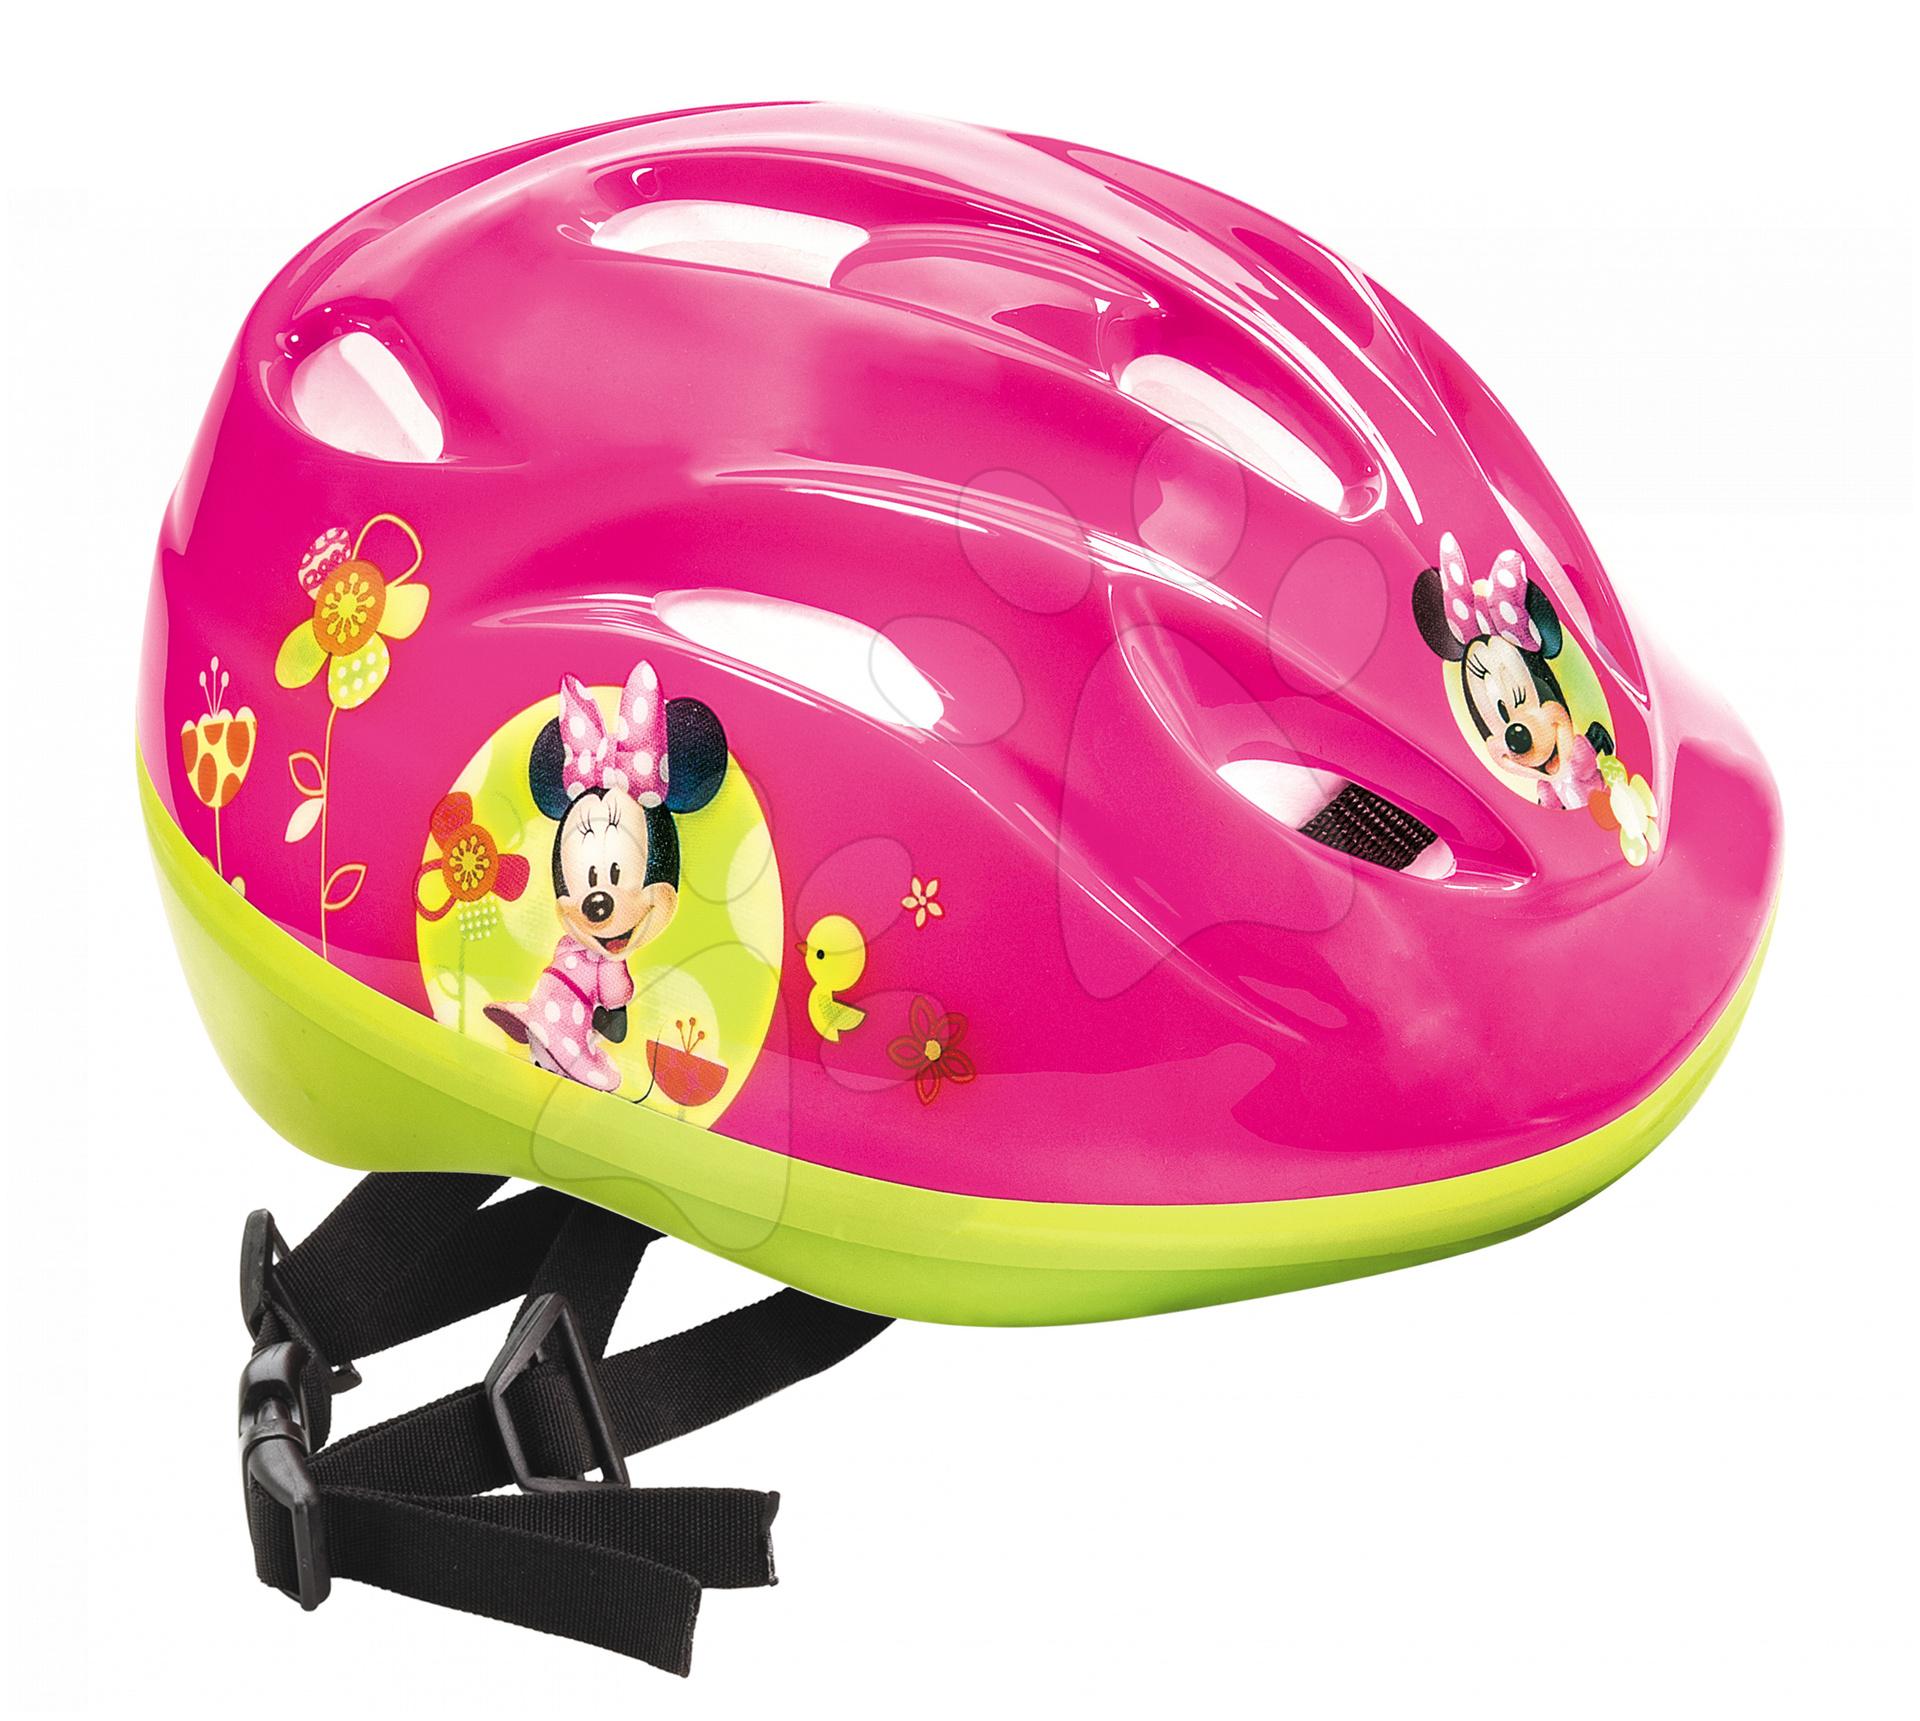 Cyklistická přilba Minnie Bow-tique Mondo velikost 52-56 růžovo-zelená